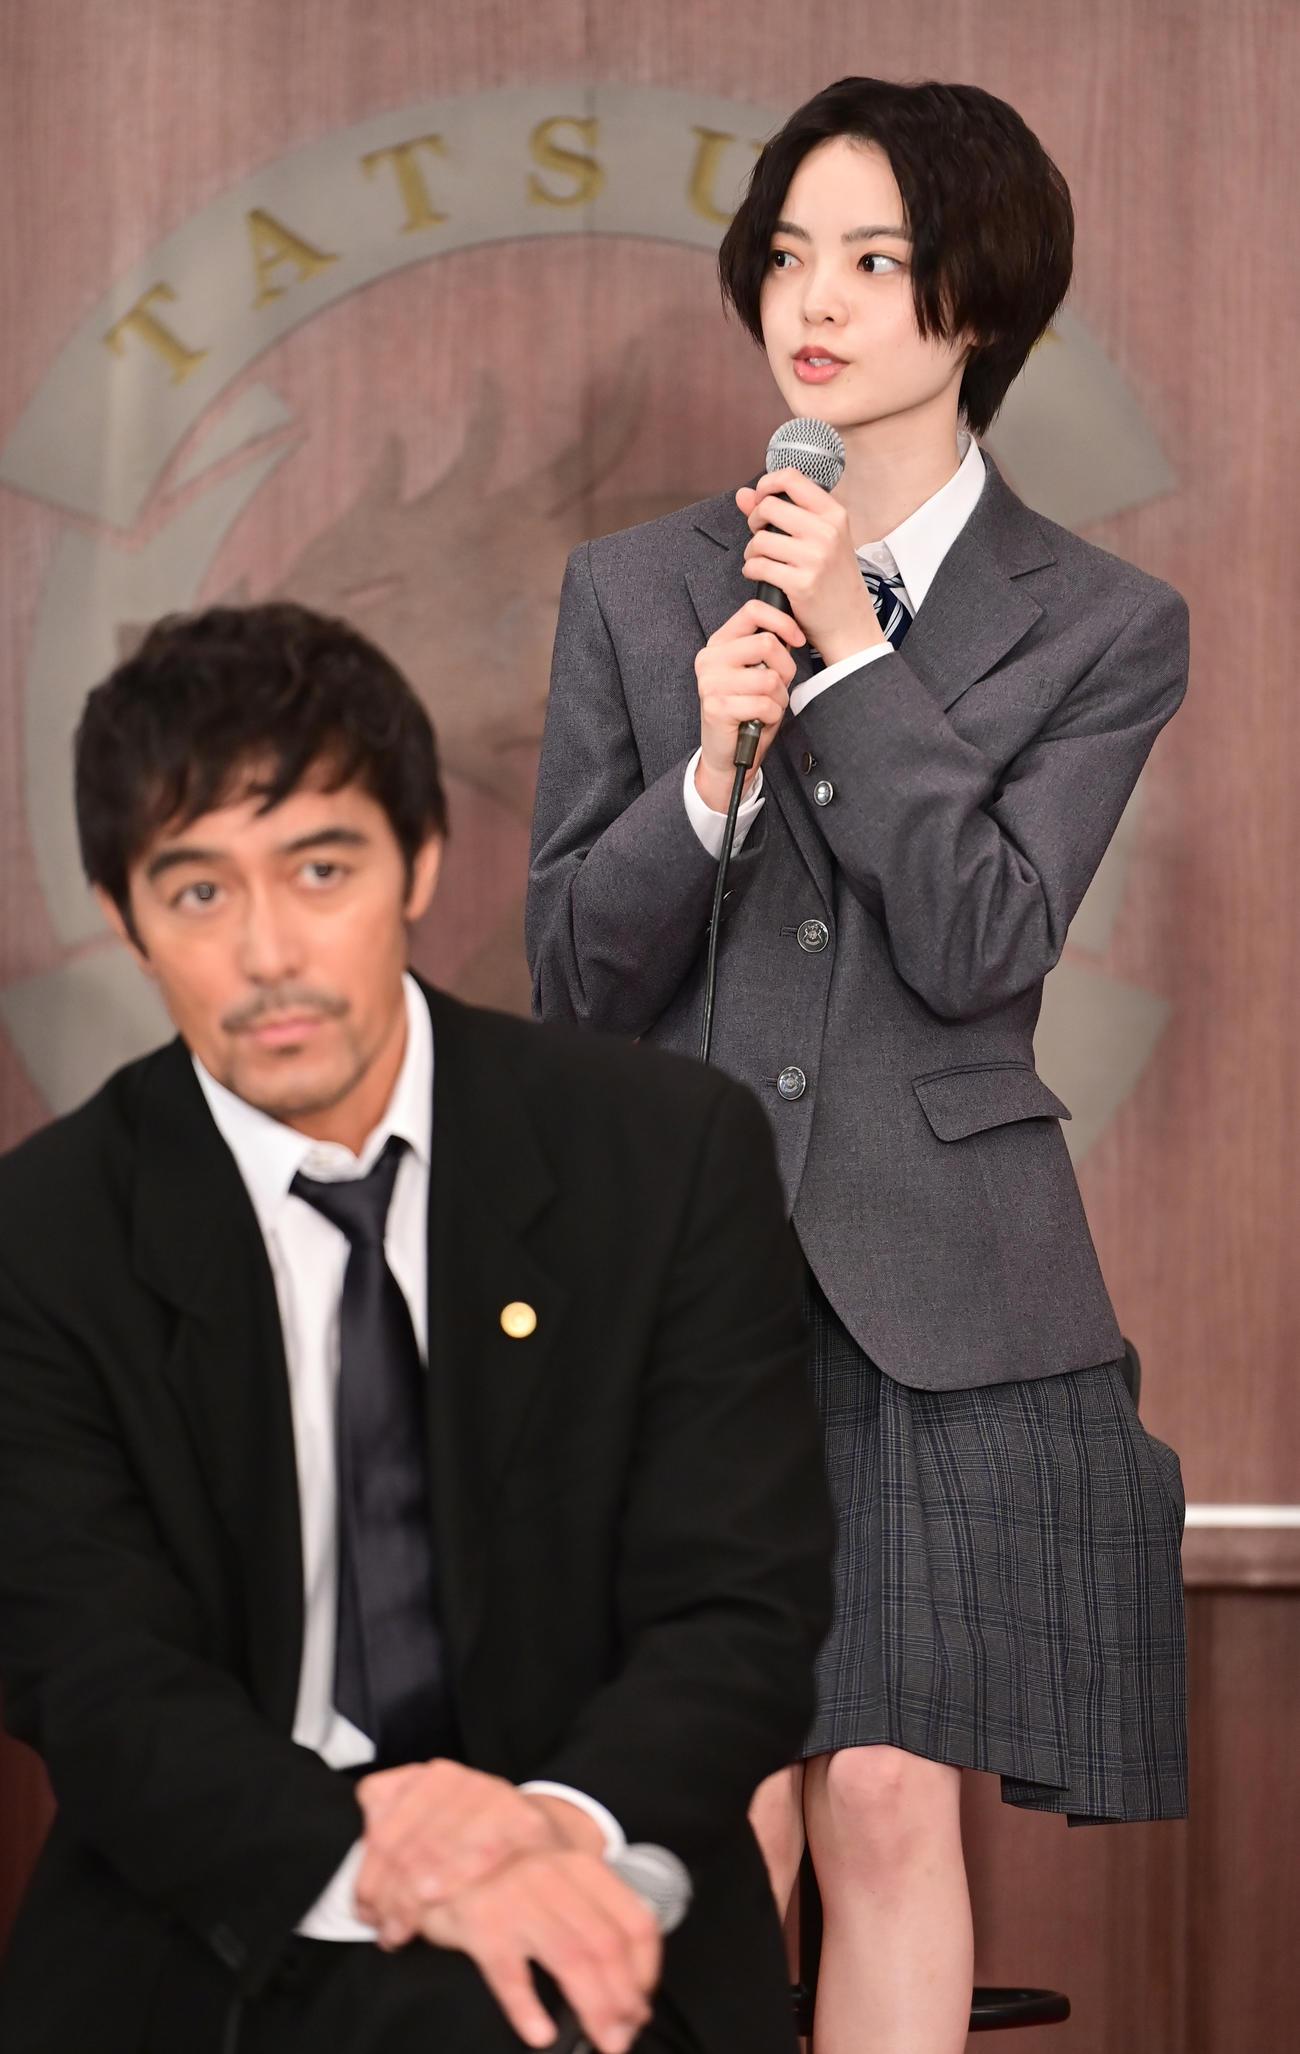 TBS系日曜劇場「ドラゴン桜」制作発表に臨む平手友梨奈。手前は阿部寛(撮影・小沢裕)